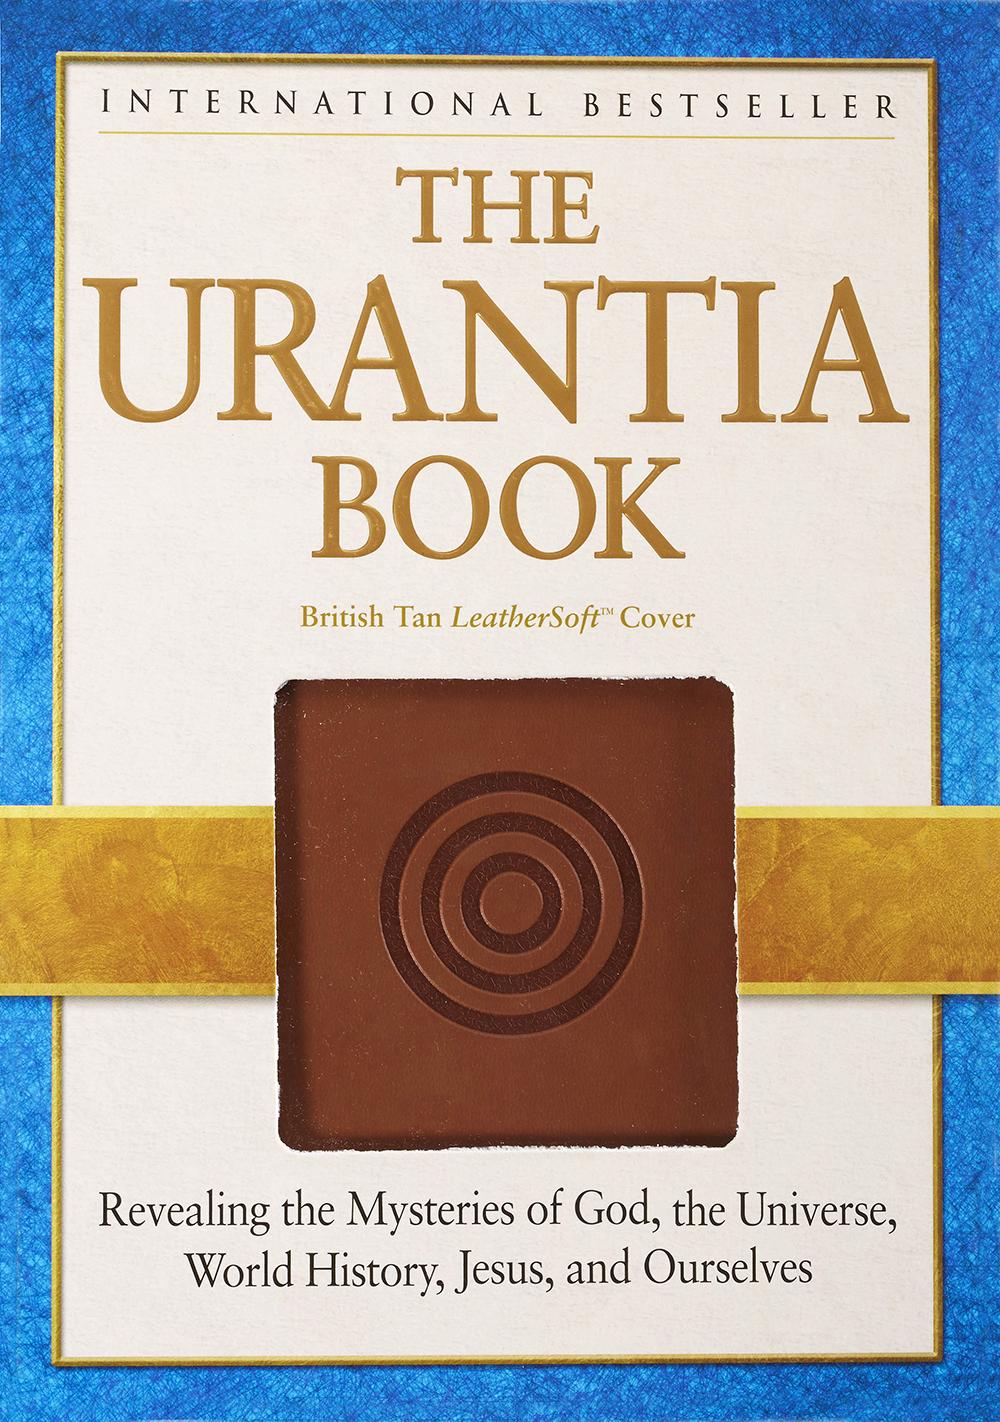 2015 The Urantia Book - Boxed - British Tan Leathersoft